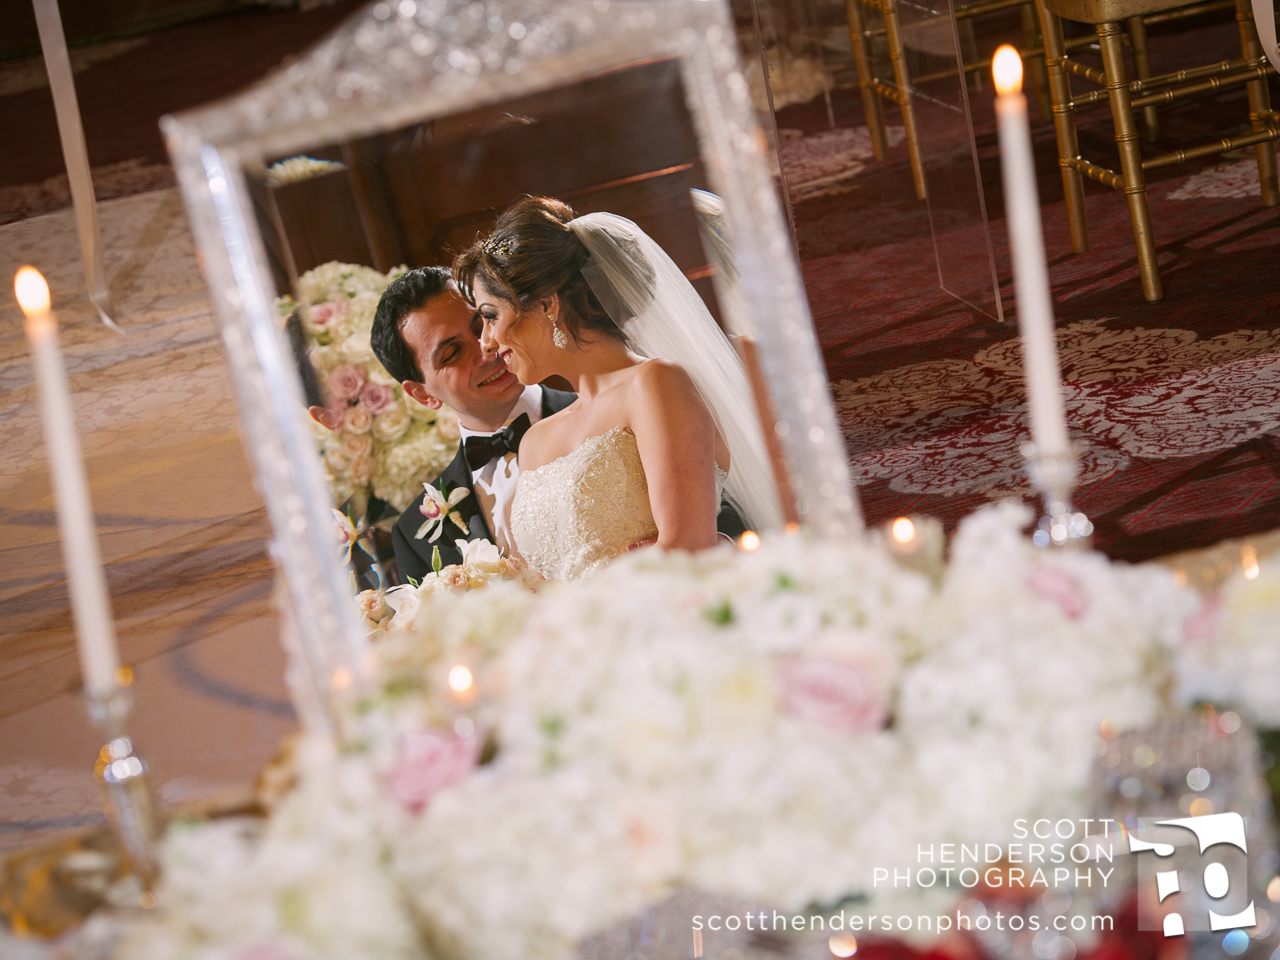 yearinreview-wedding-009.jpg